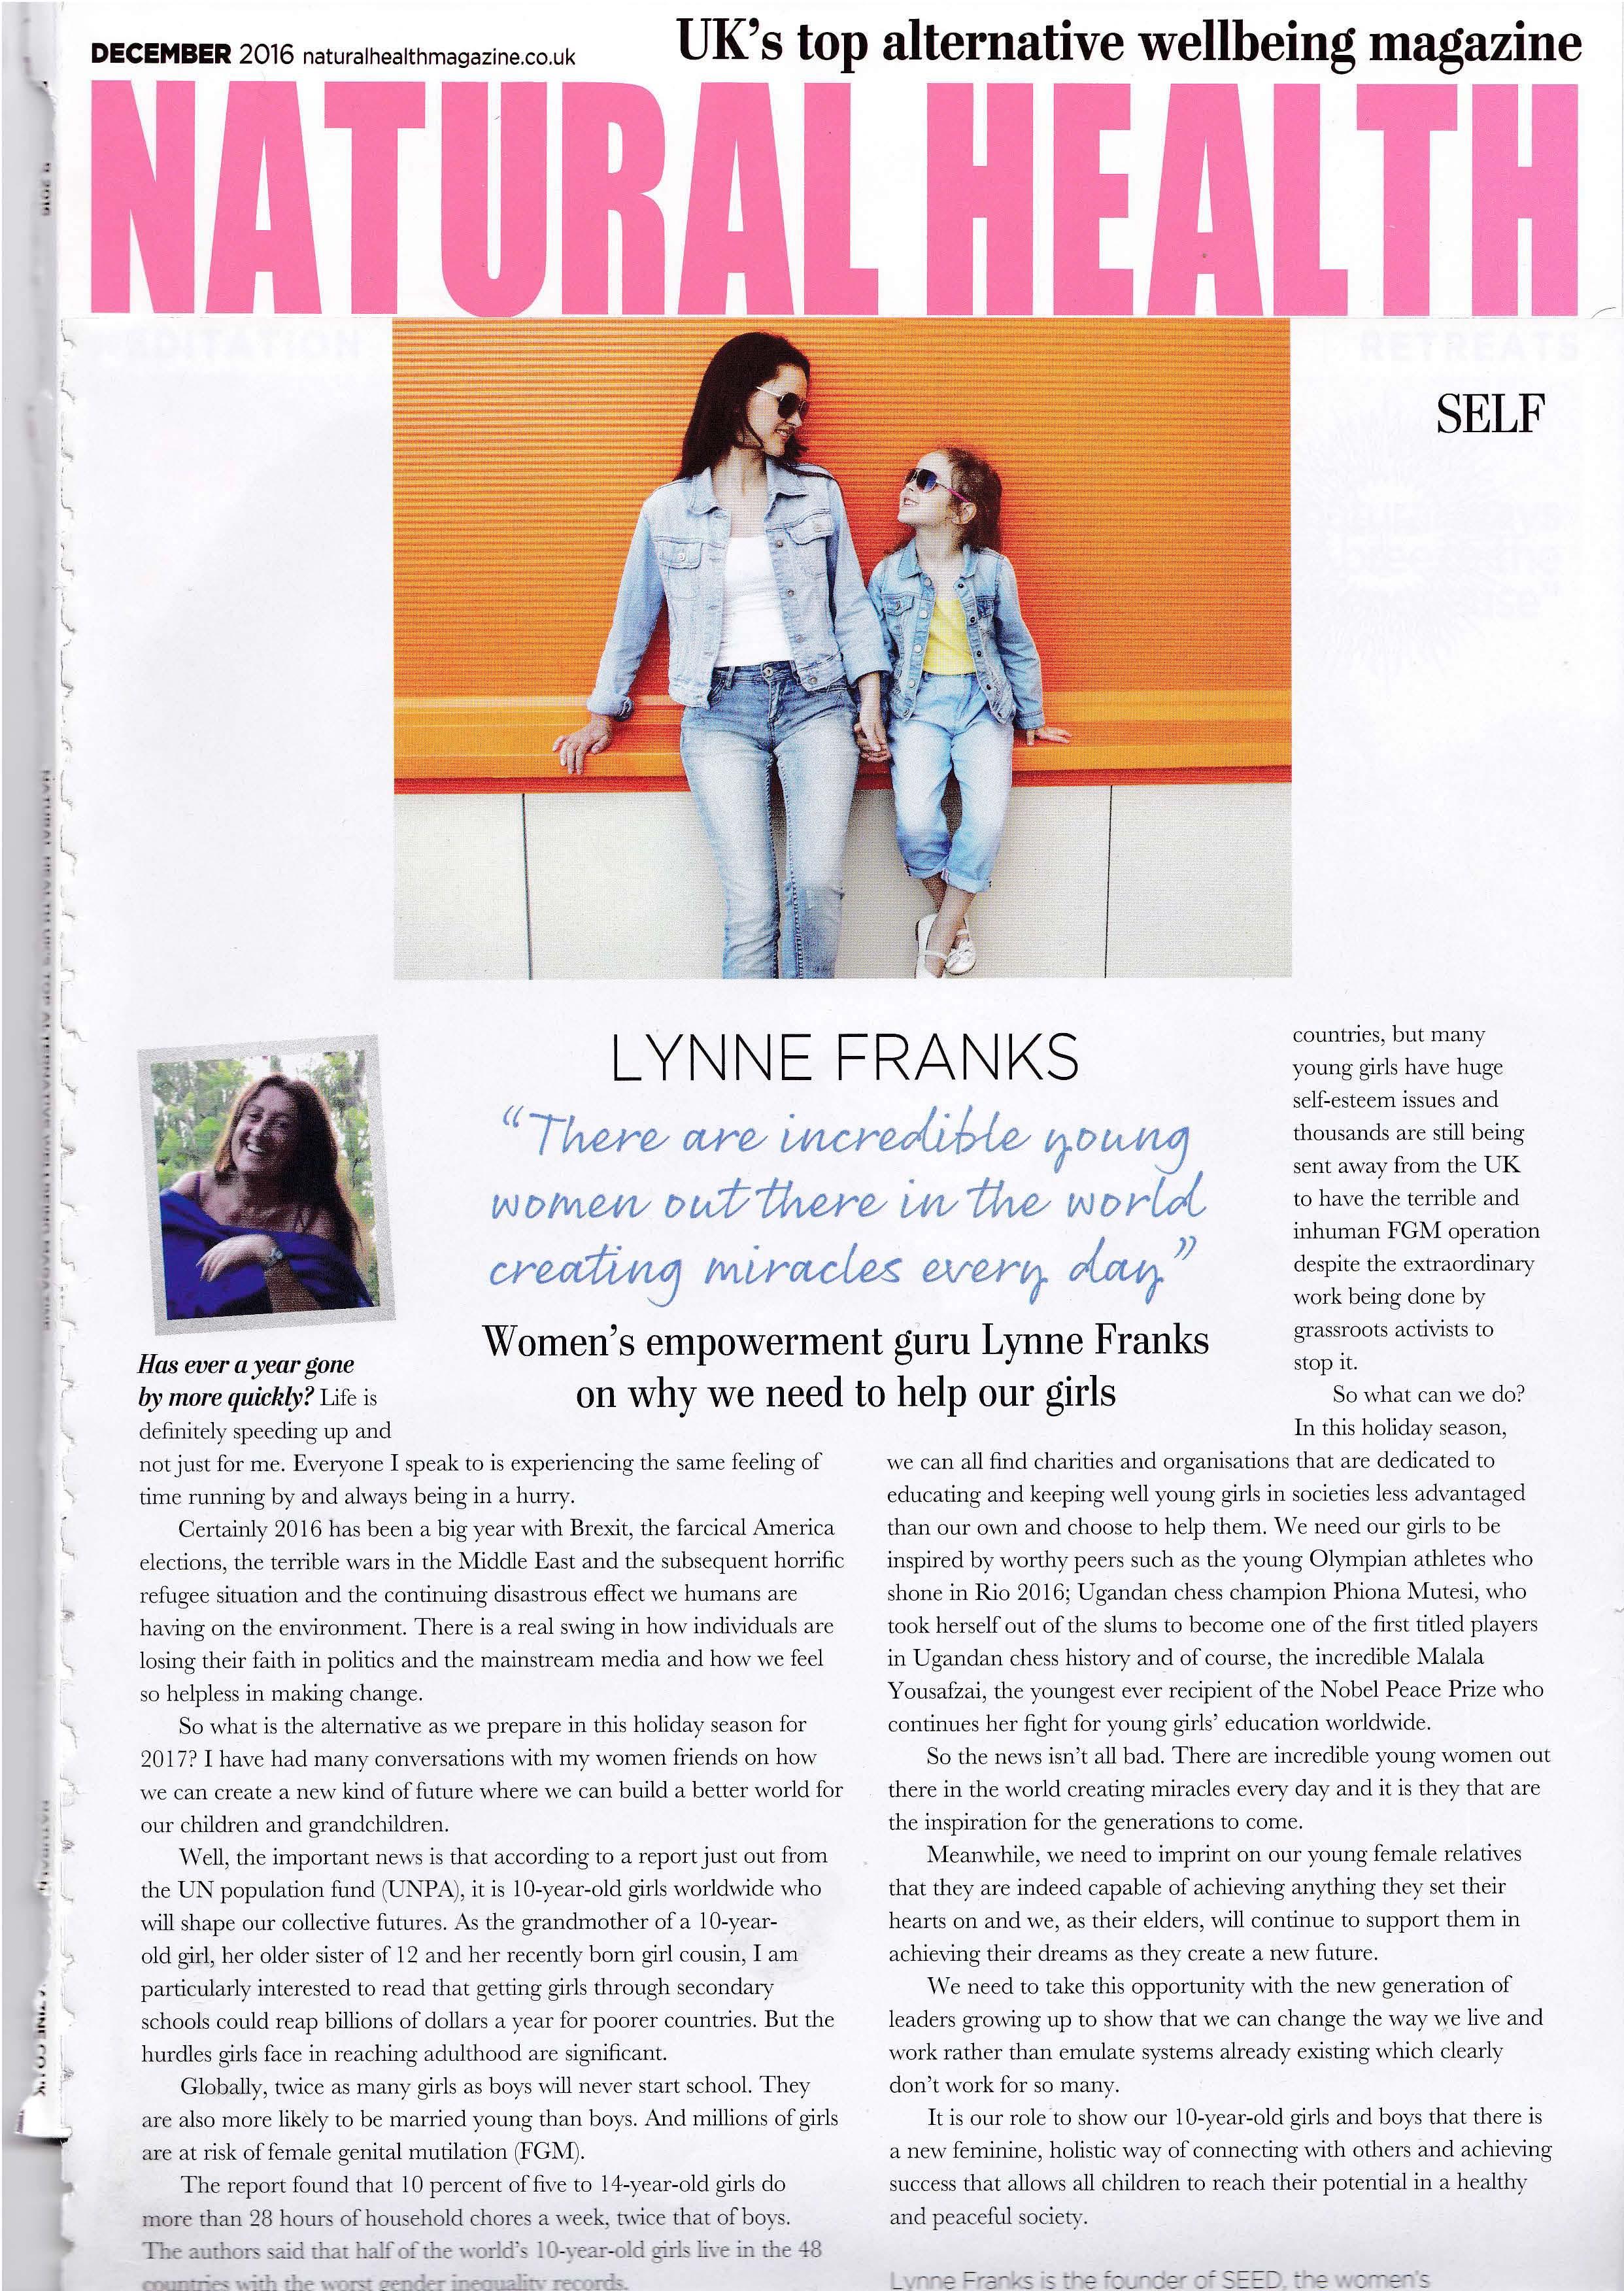 Lynne-Franks-natural-Health-magazine